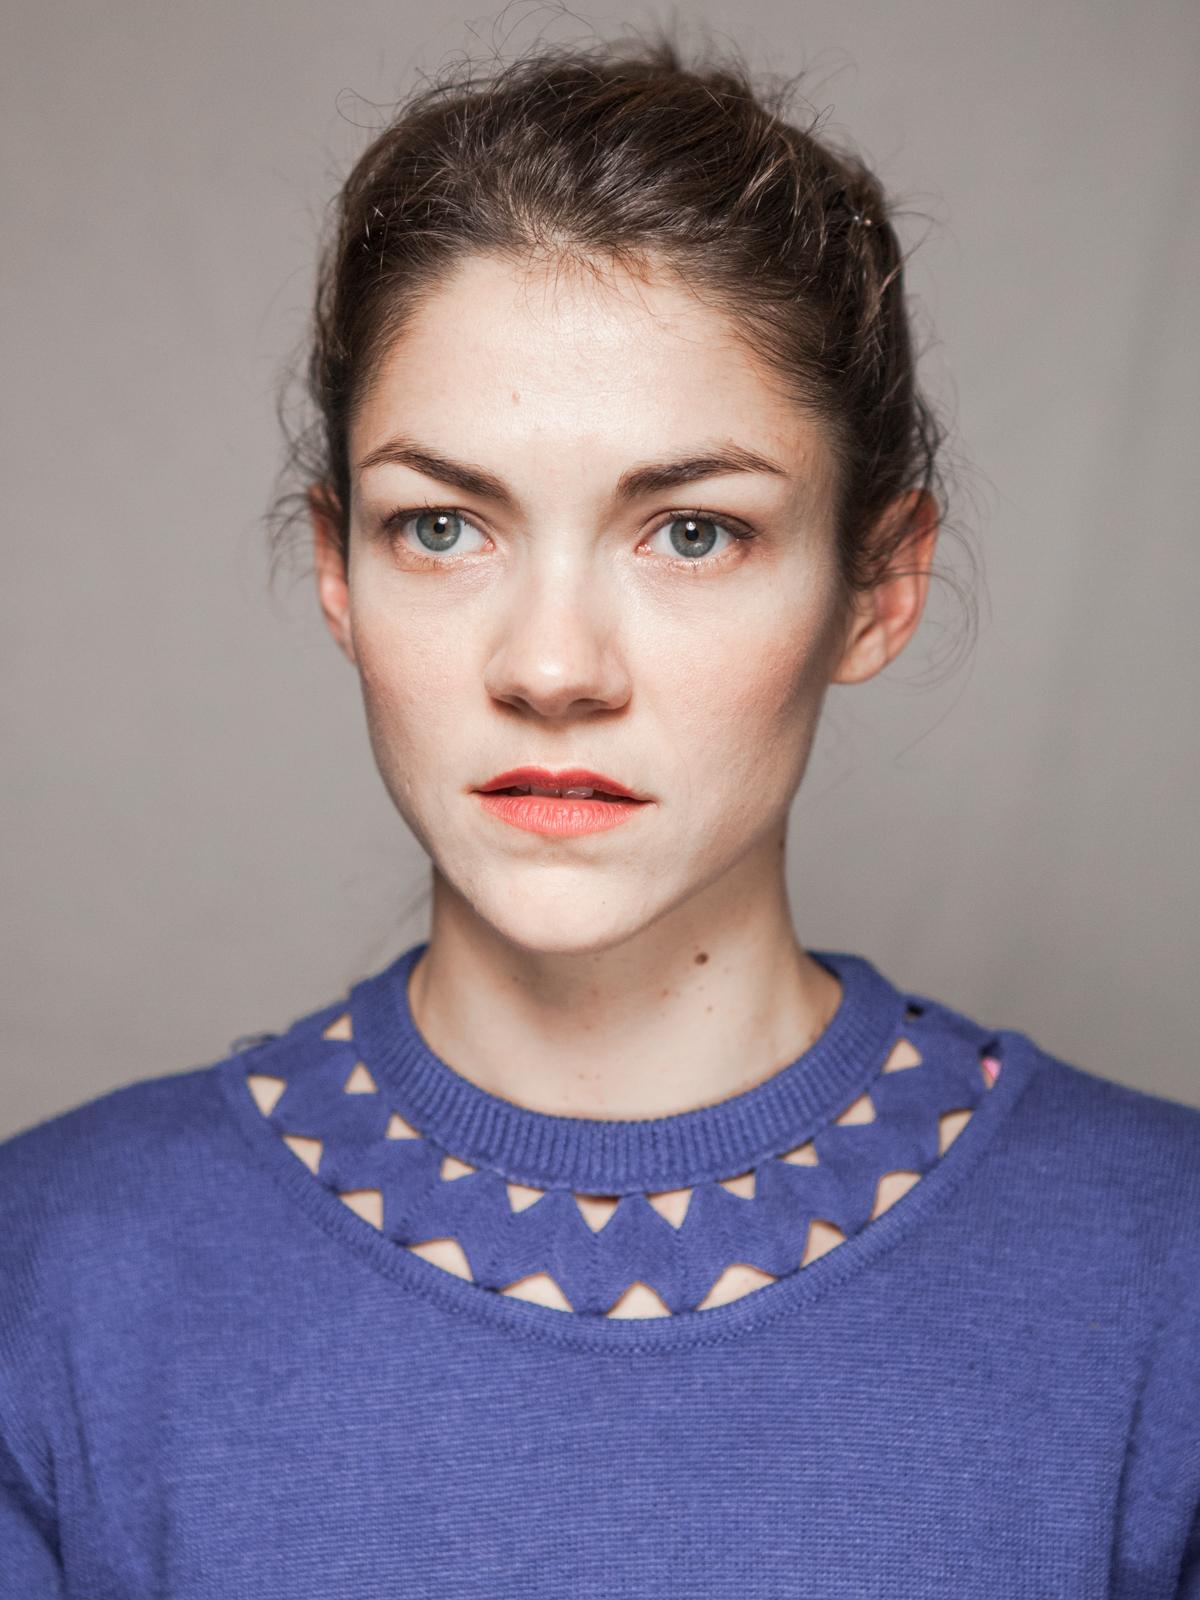 Olivia Ross, actor - Headshot/Studio photography